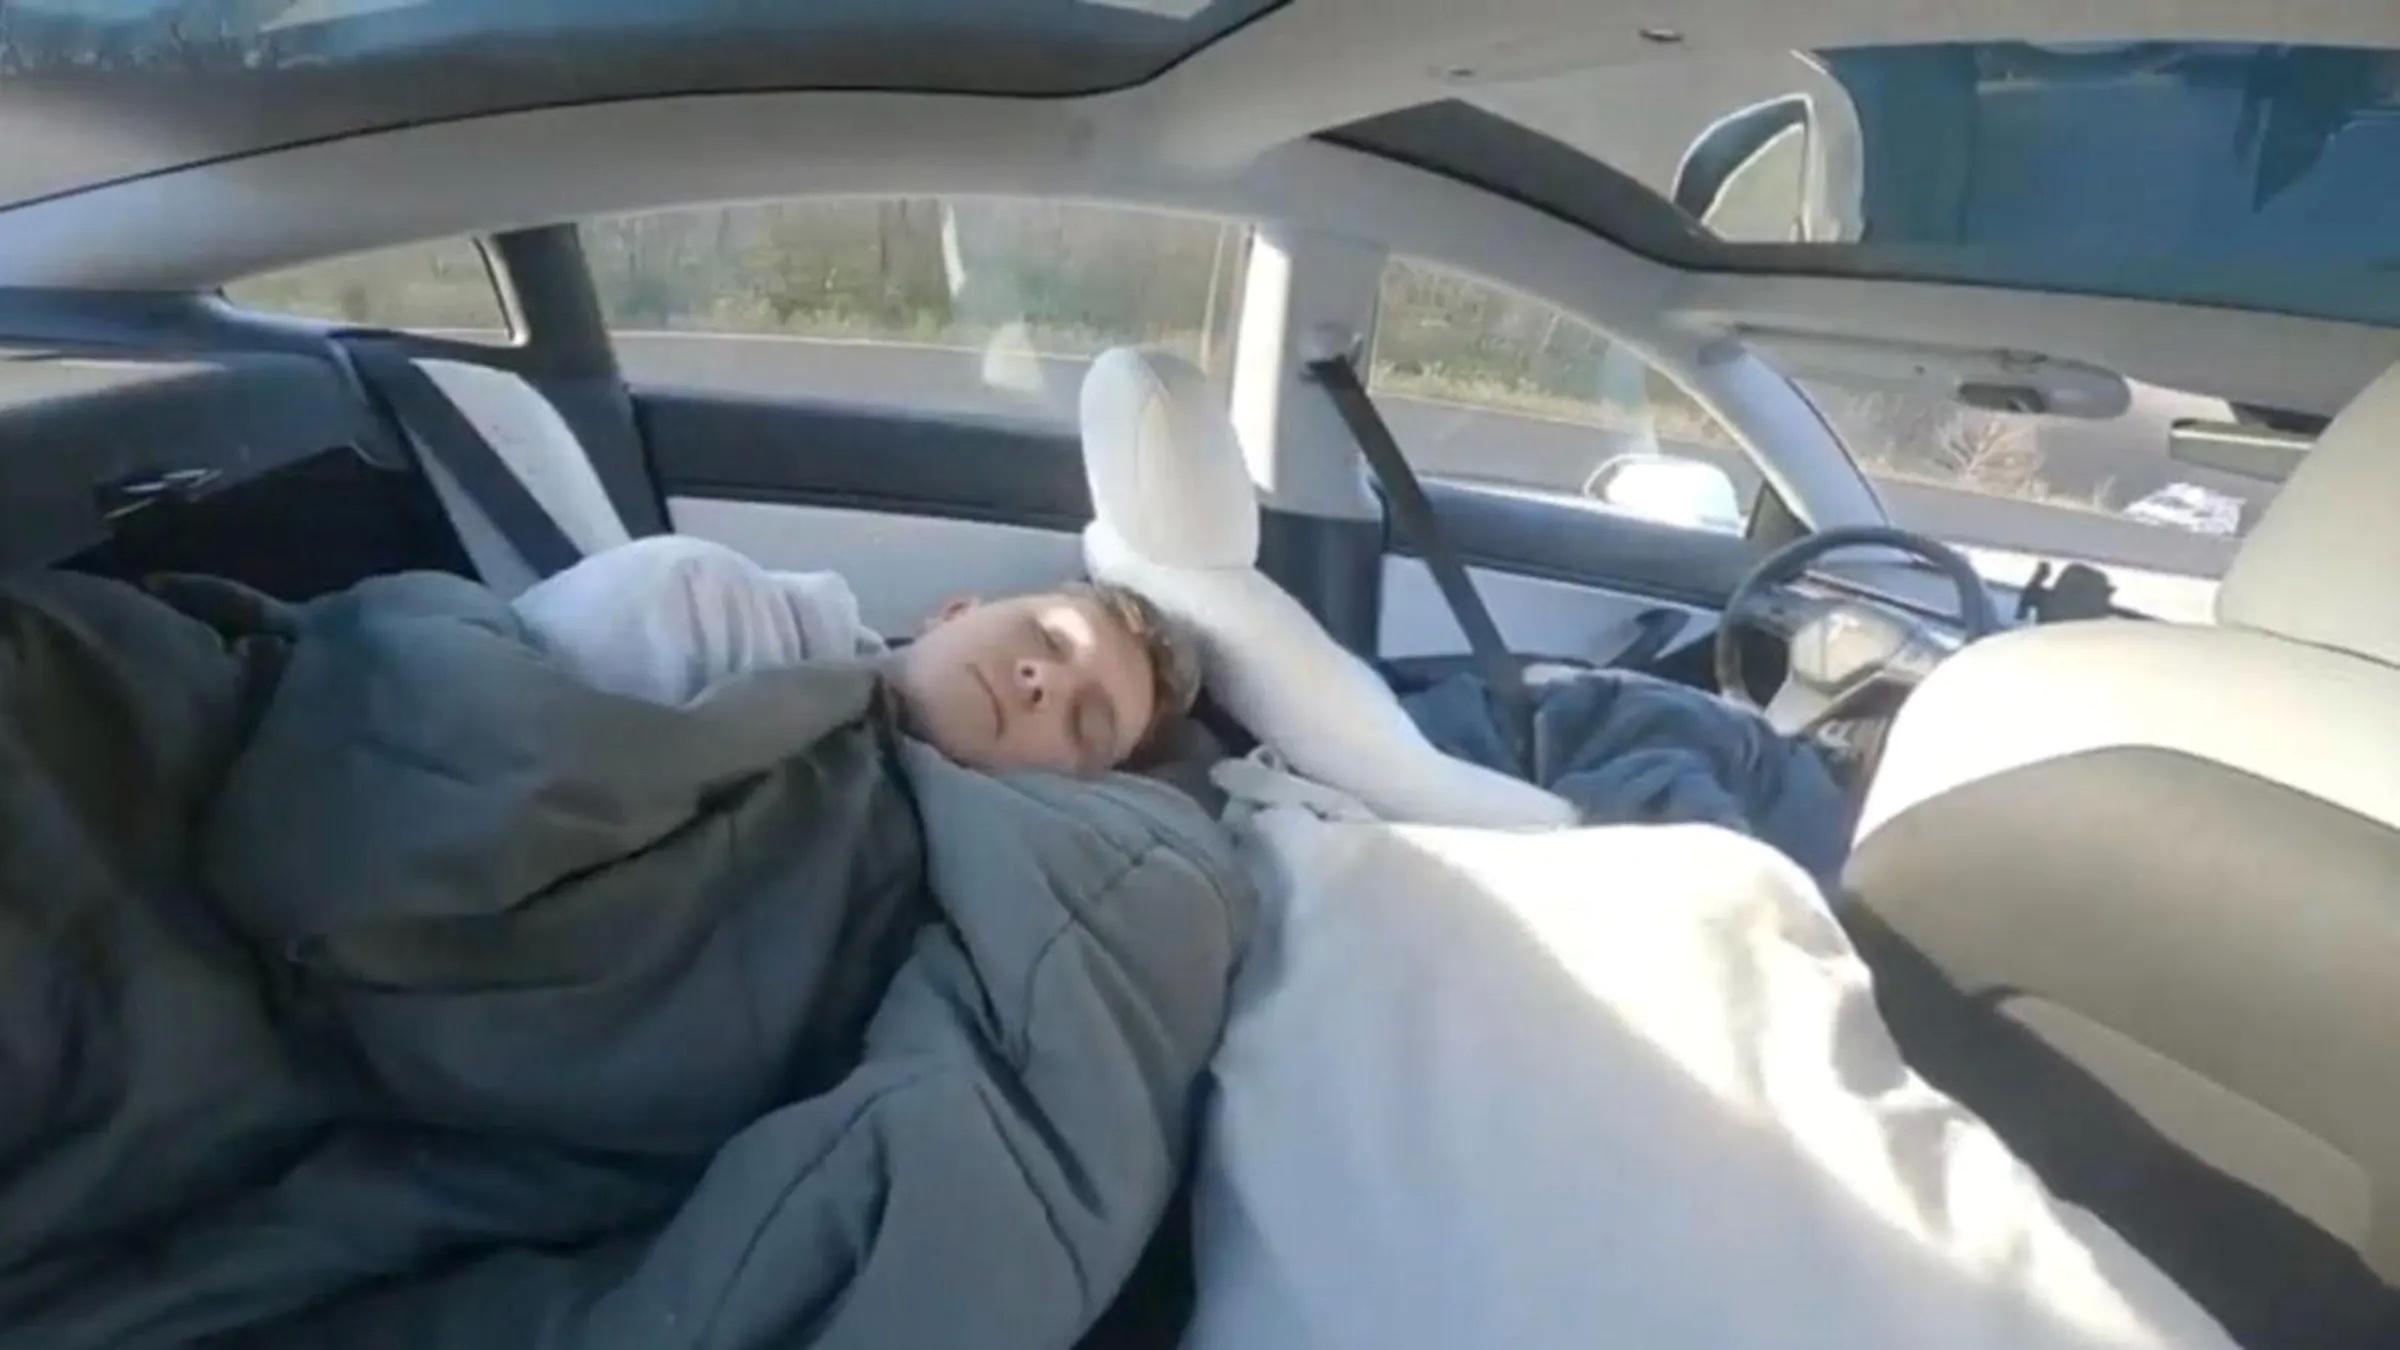 Spiaci chlapec v Tesla Model 3